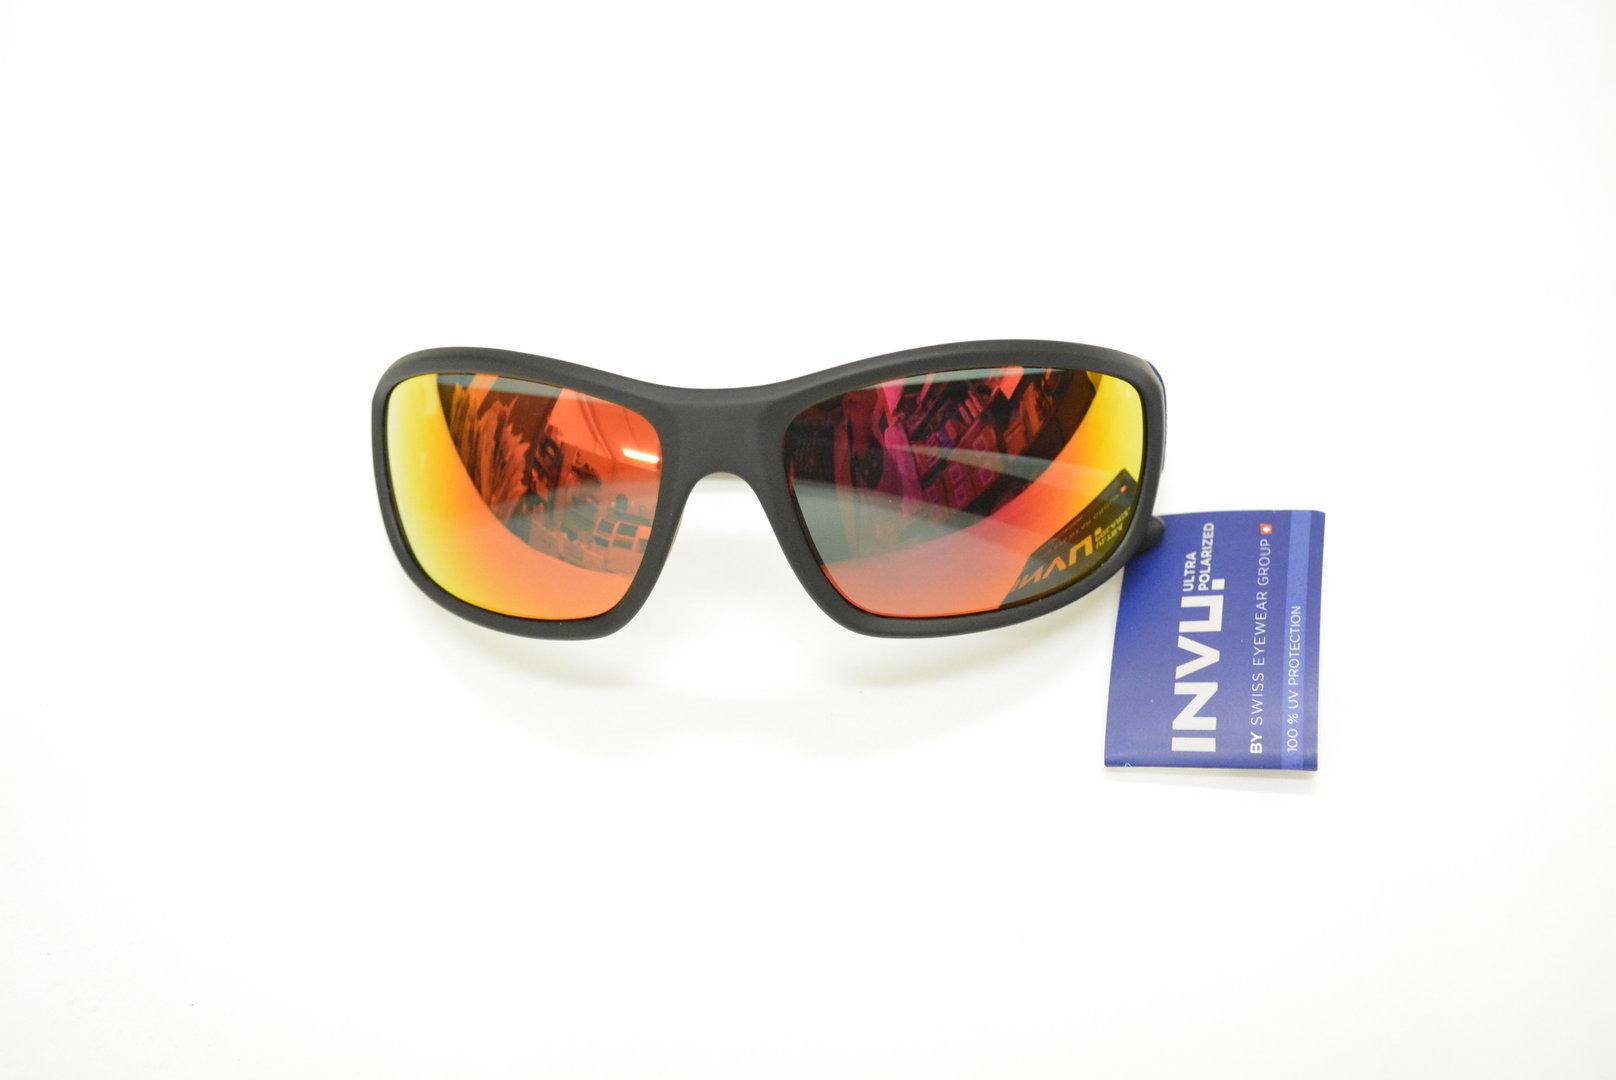 bca8ed0334 Sunglasses INVU A 2501 F BLACK RUBBER POLARIZED OTTICA TRAINA